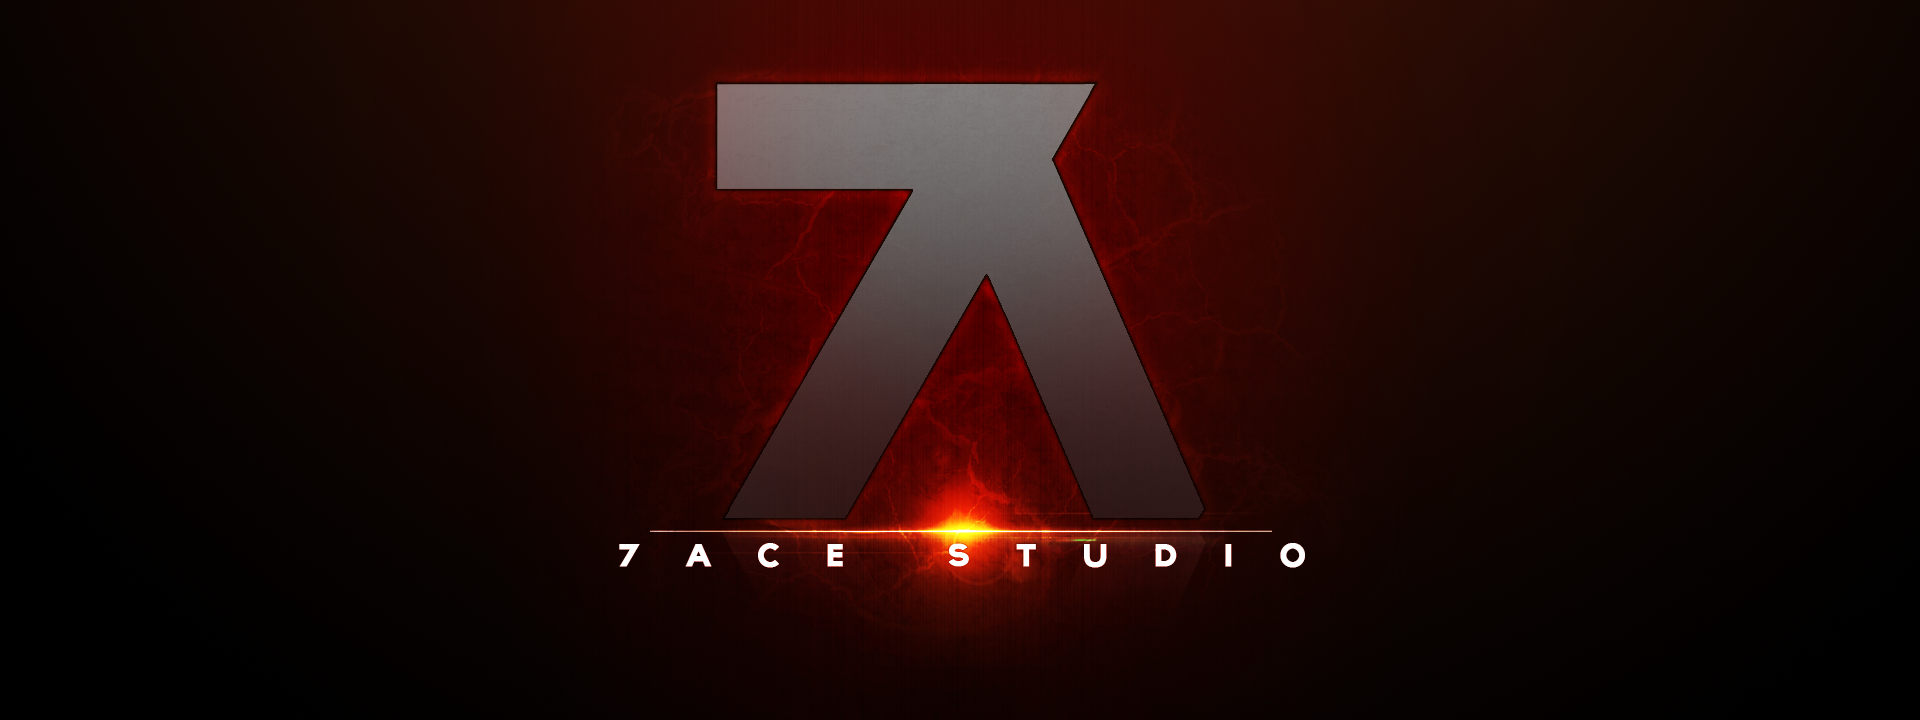 7Ace Studio - HD Logo